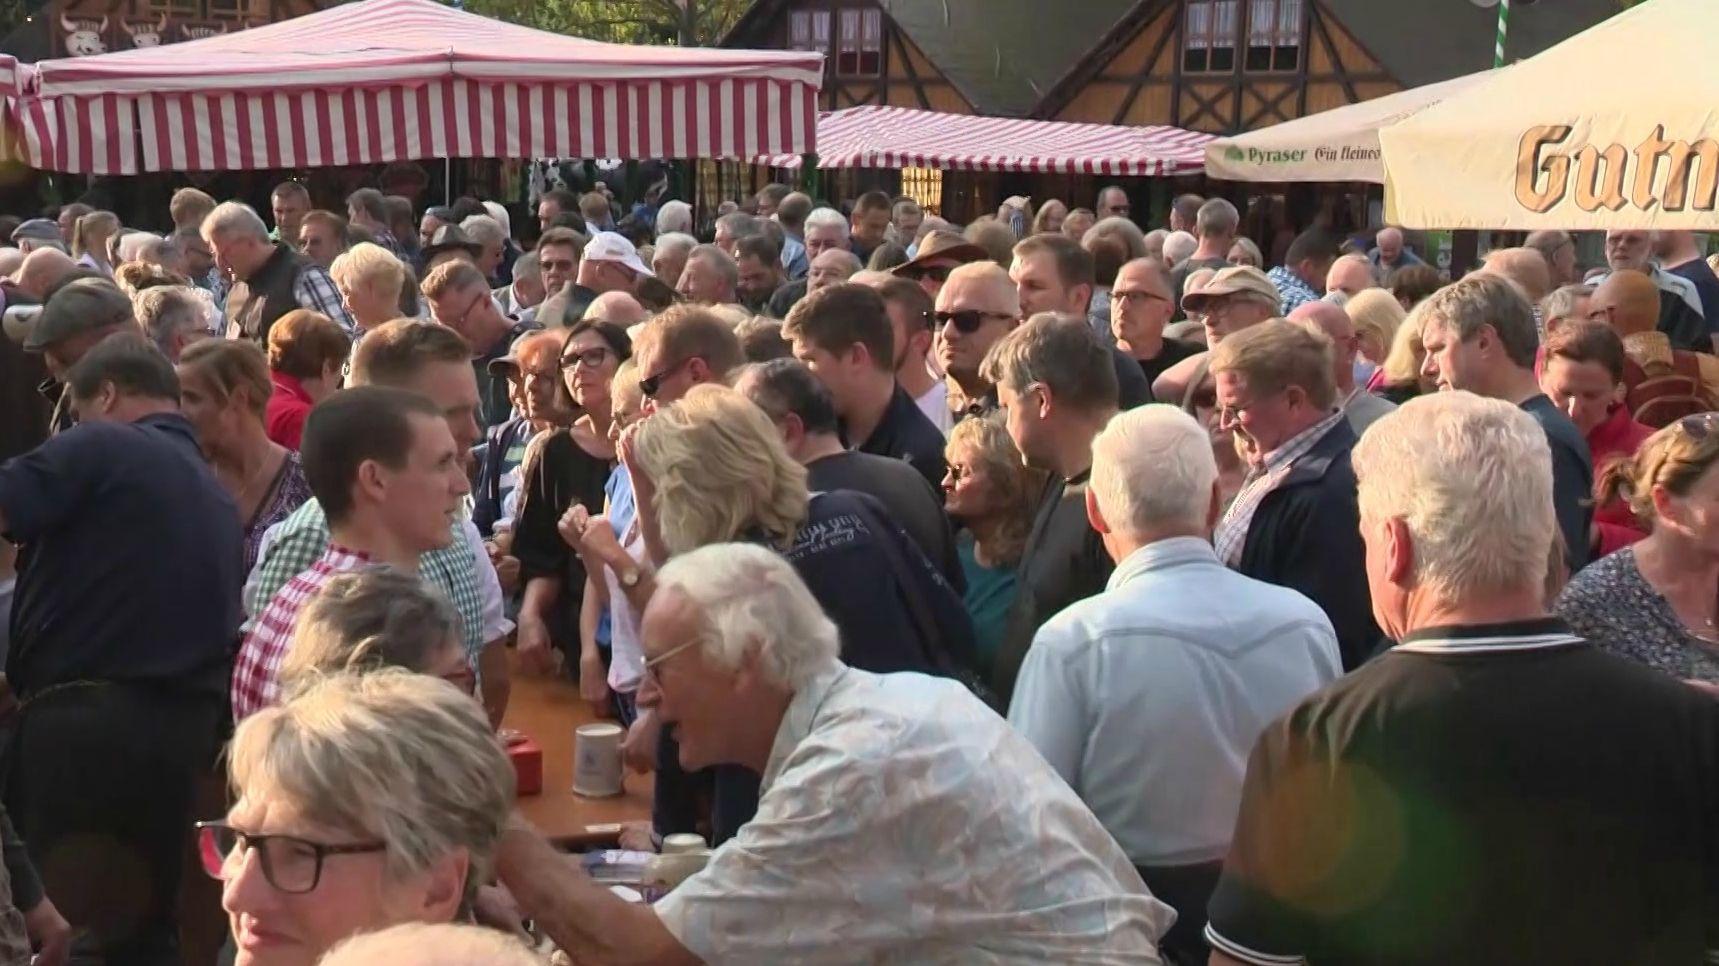 Besucher auf dem Nürnberger Altstadtfest